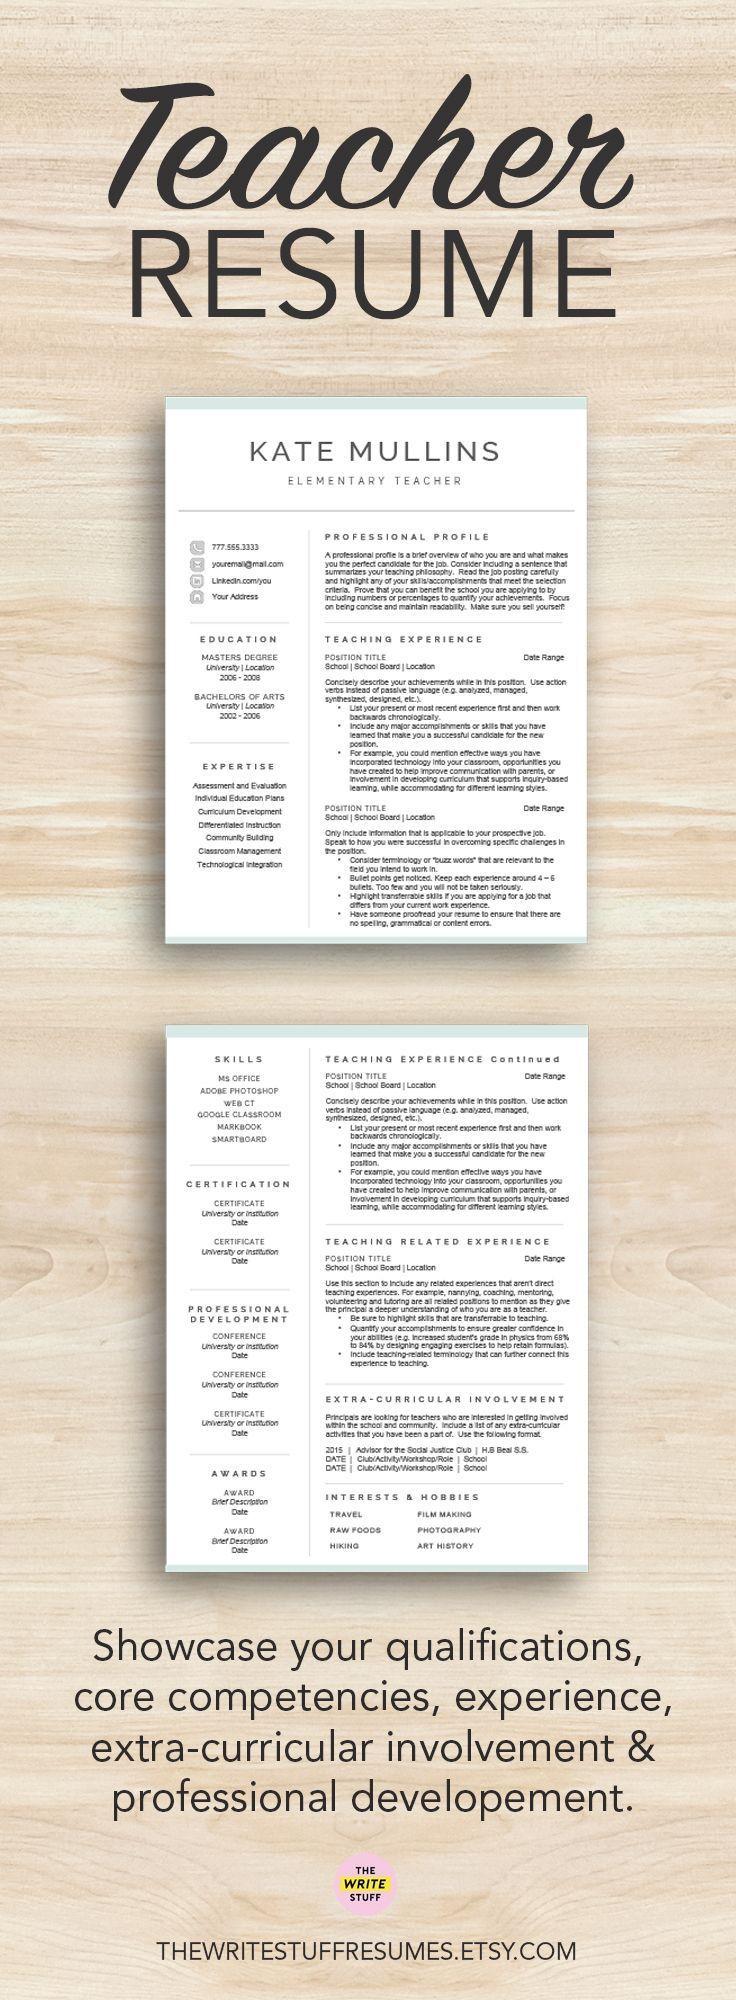 A resume designed for teachers and educators | teacher resume | educator resume | teacher resume tips | curriculum vitae